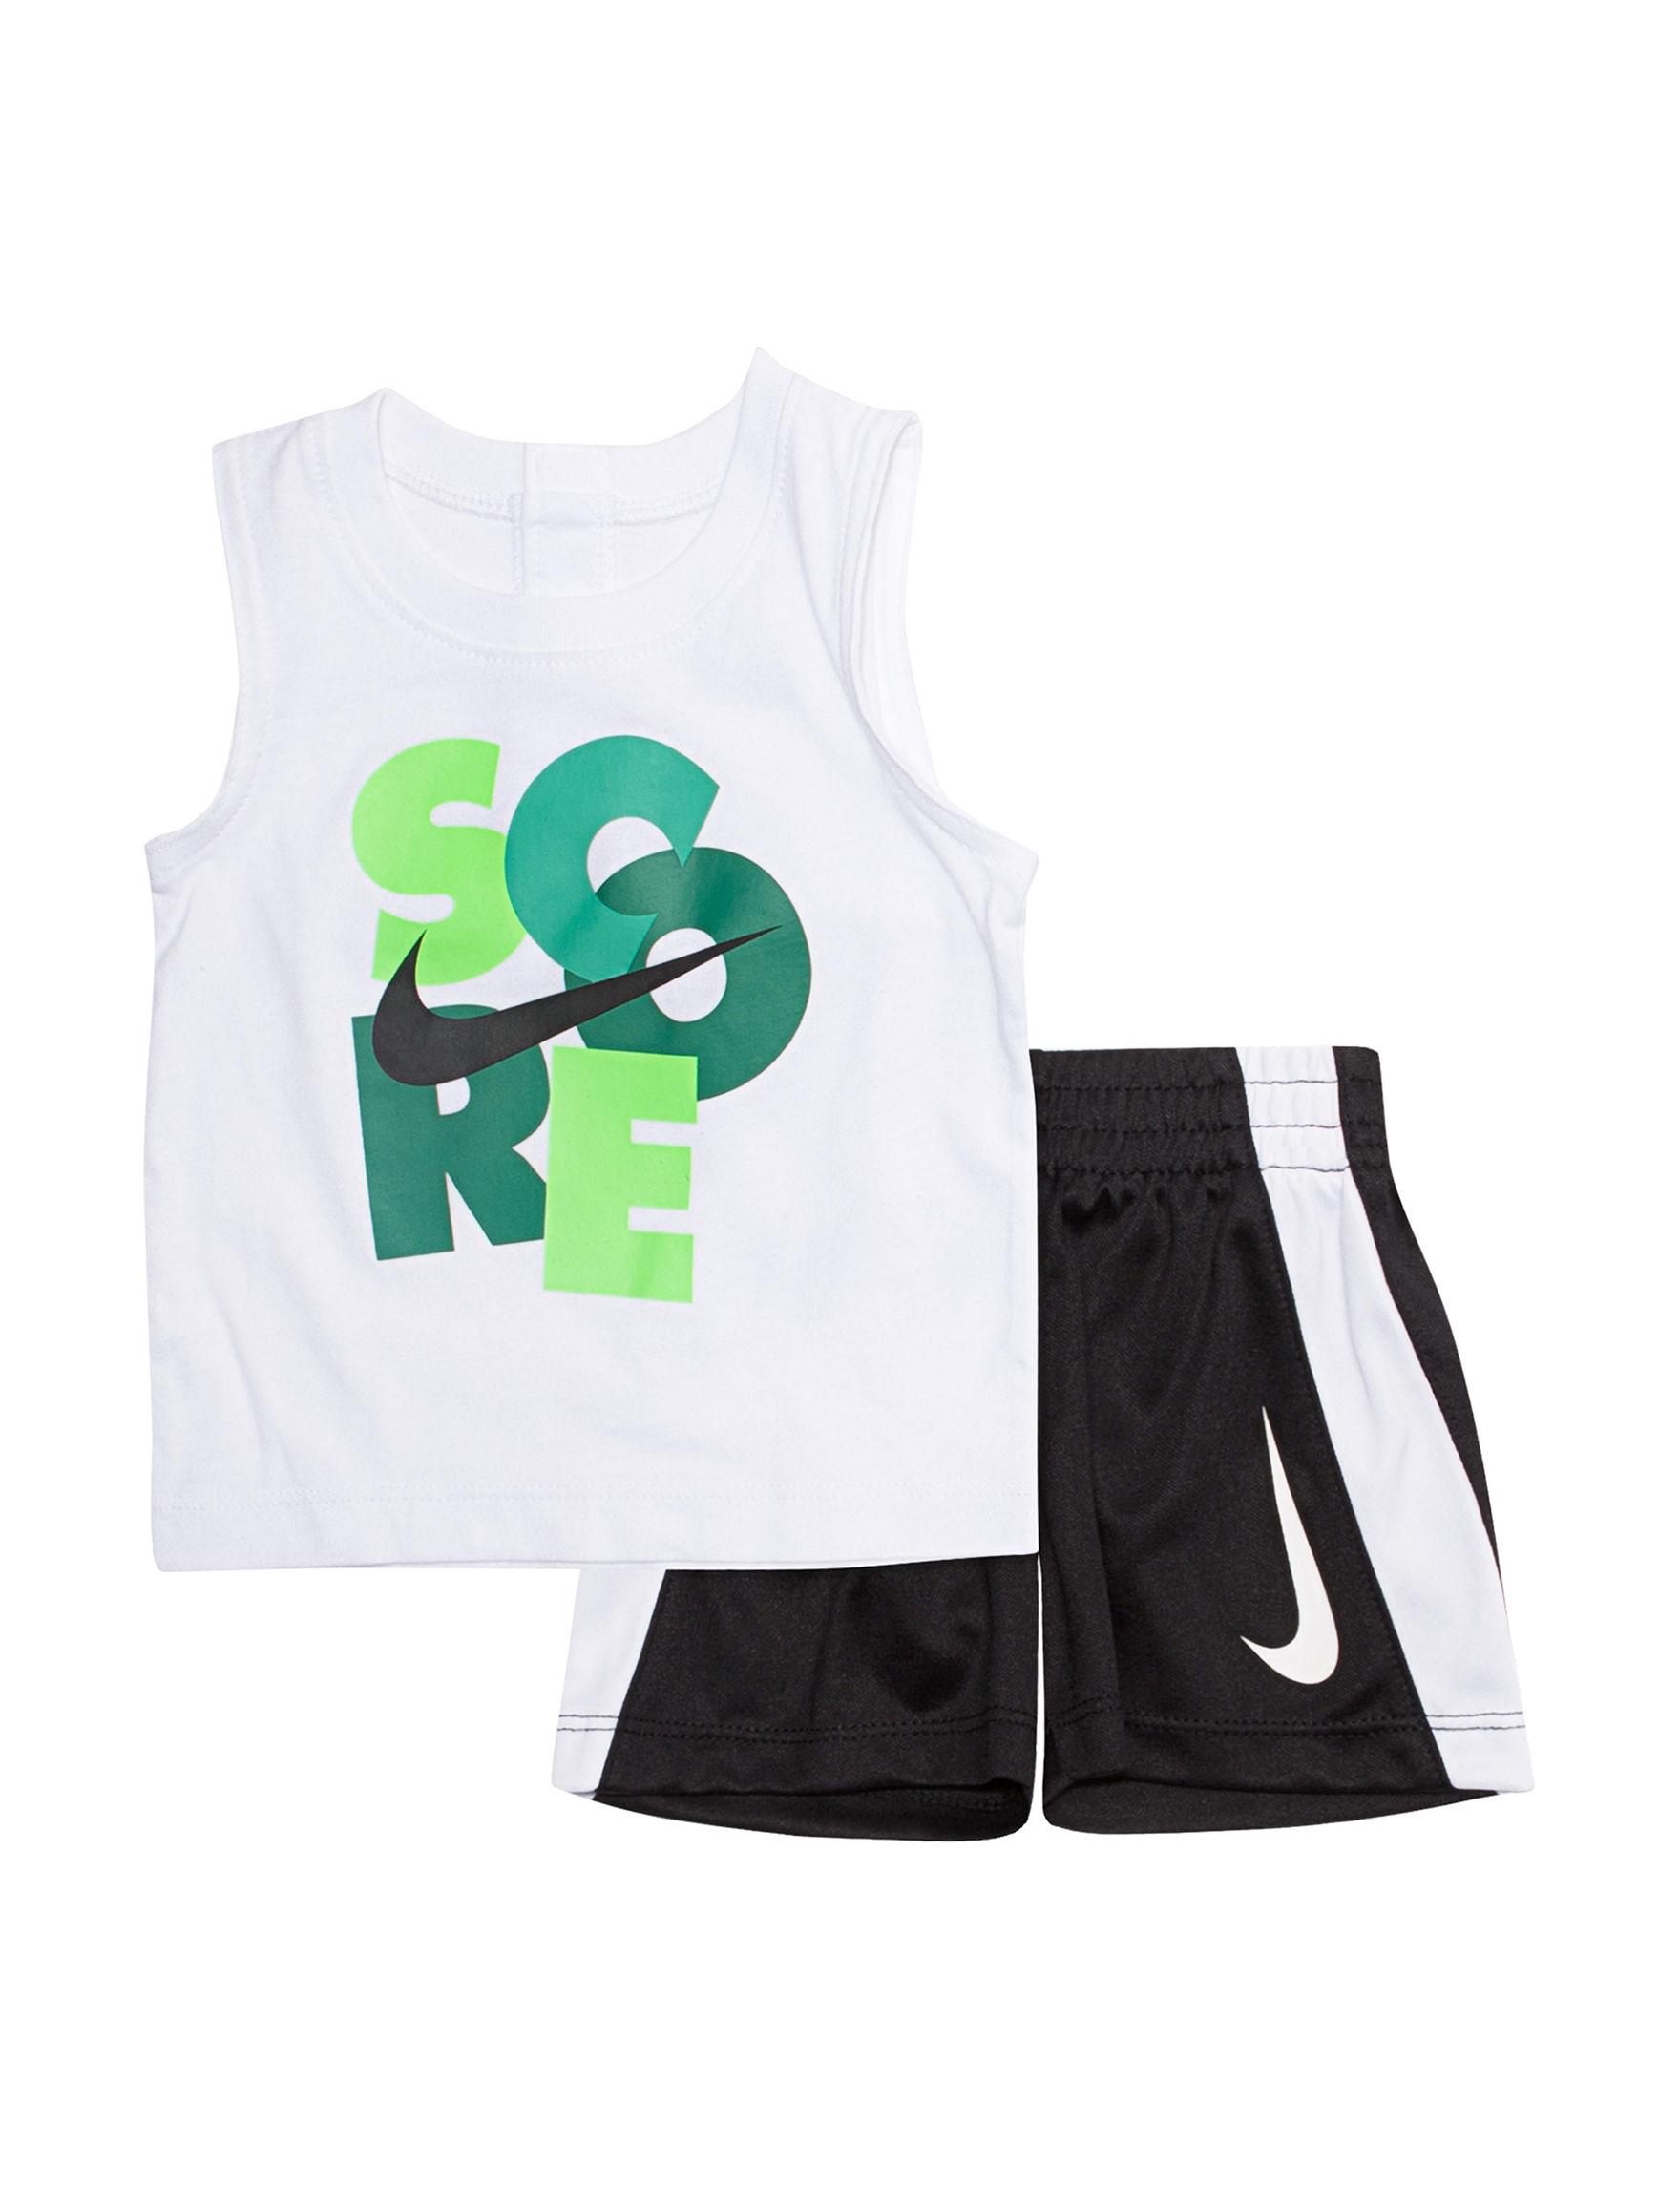 Nike White / Green